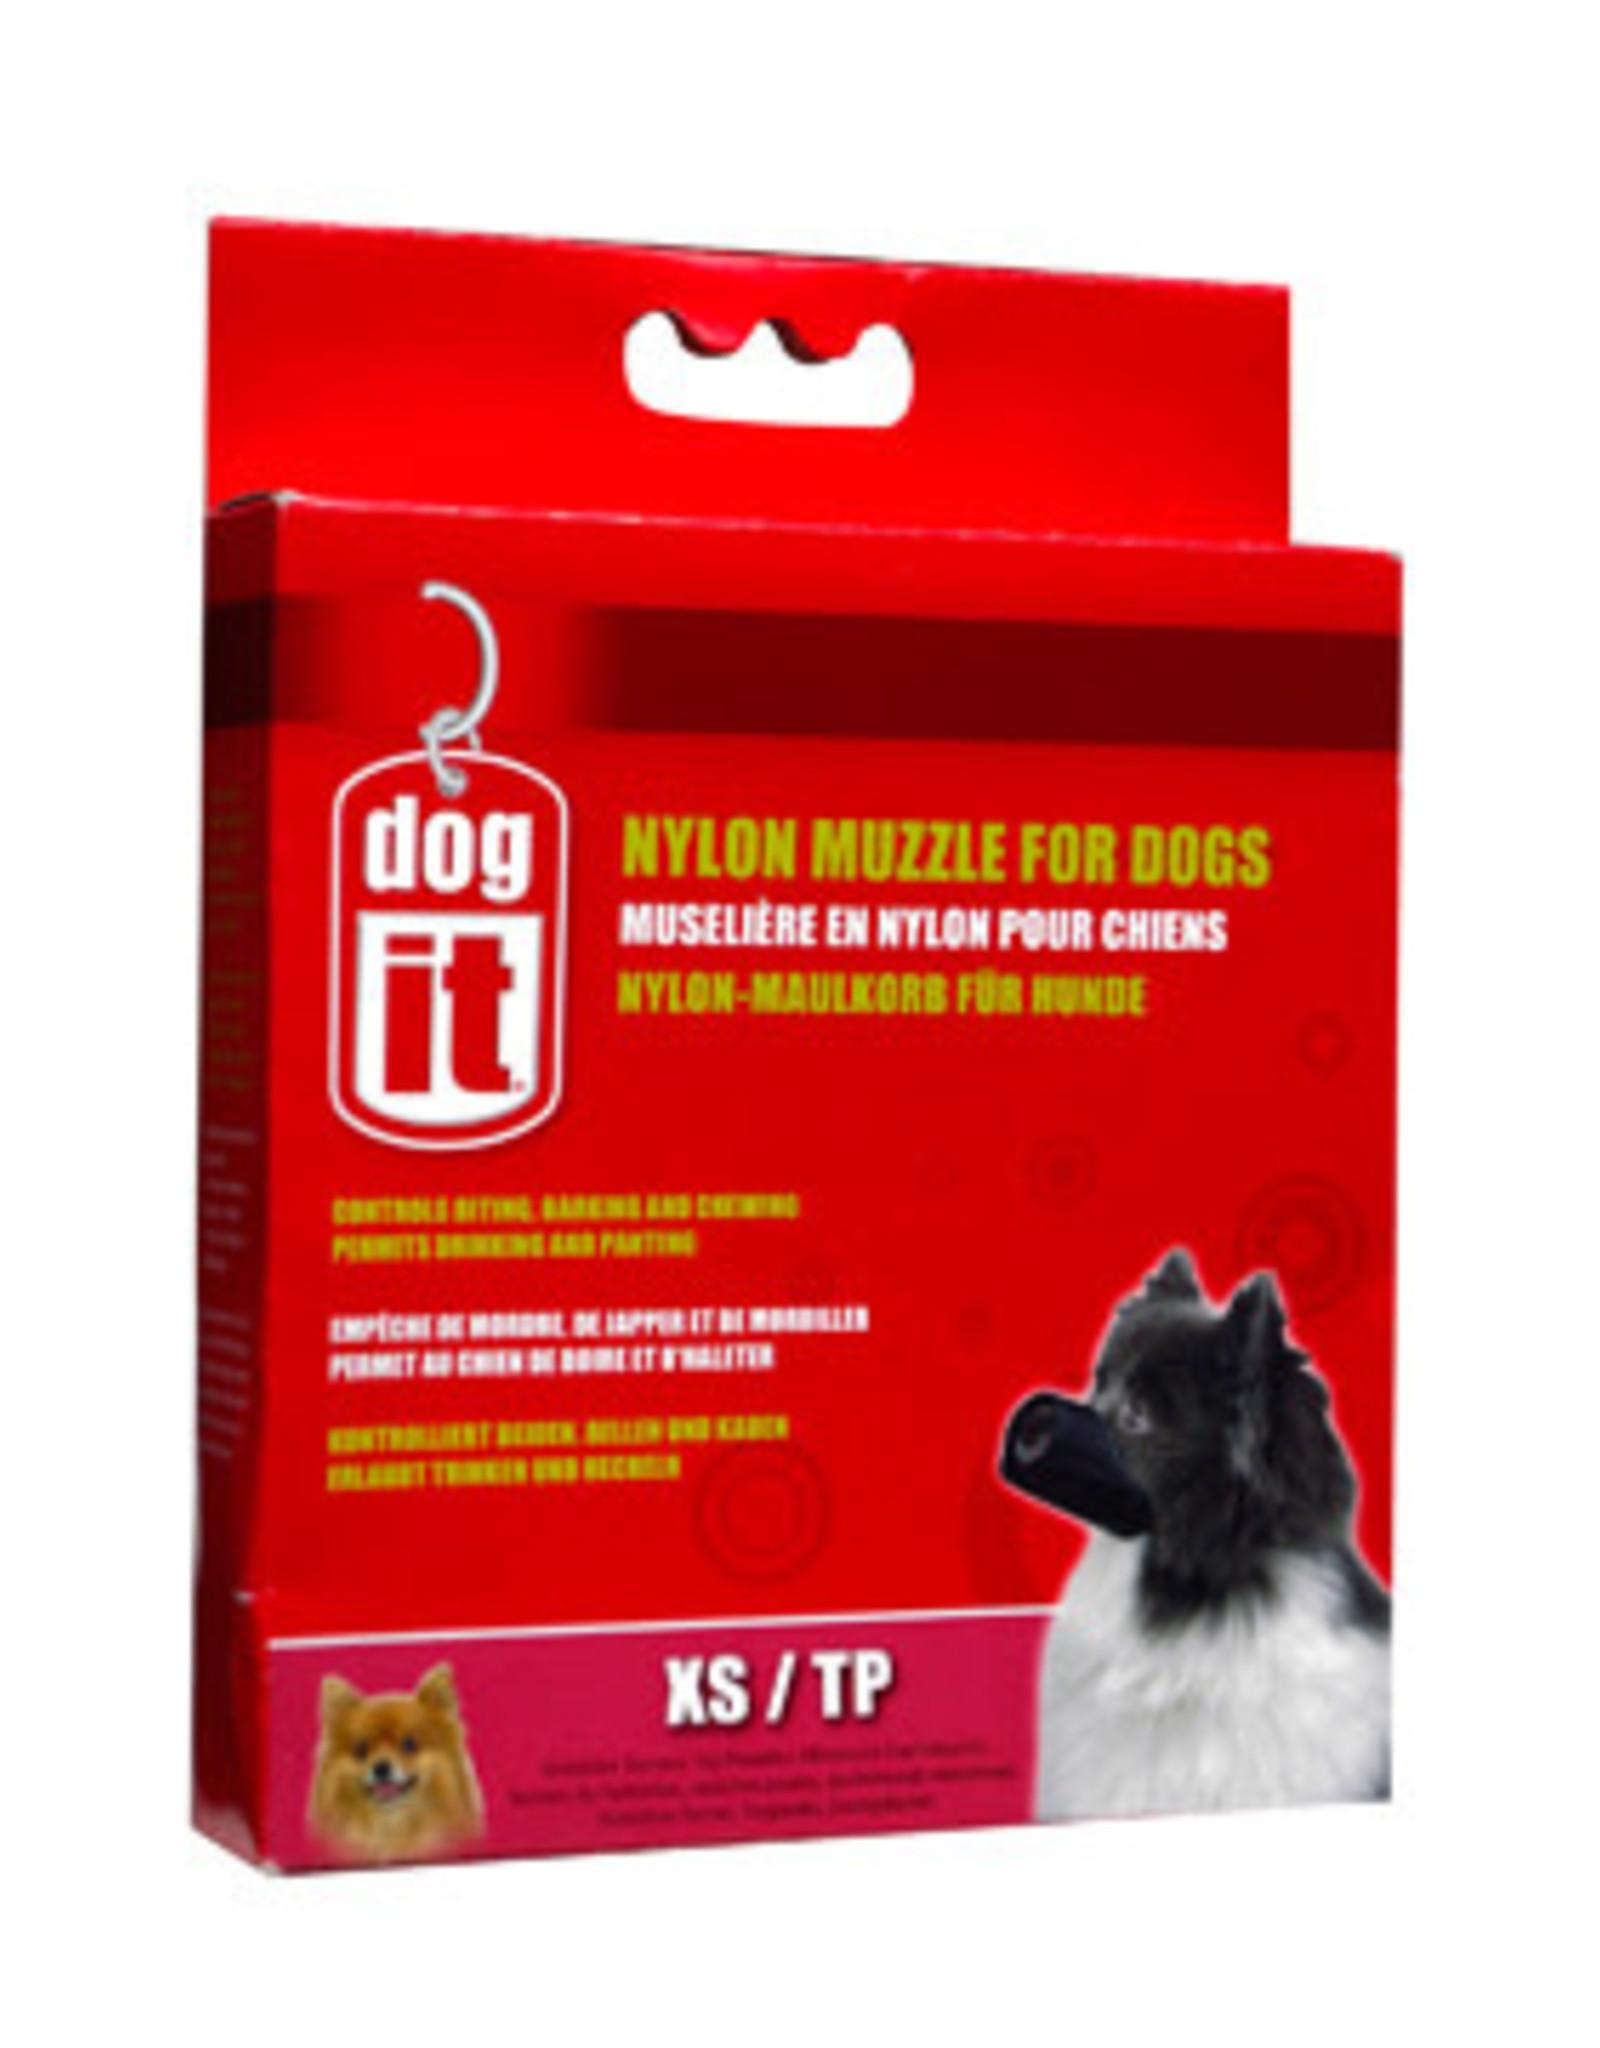 DogIt Dogit Nylon Dog Muzzle - Black - X Small (10 cm / 3.9in)